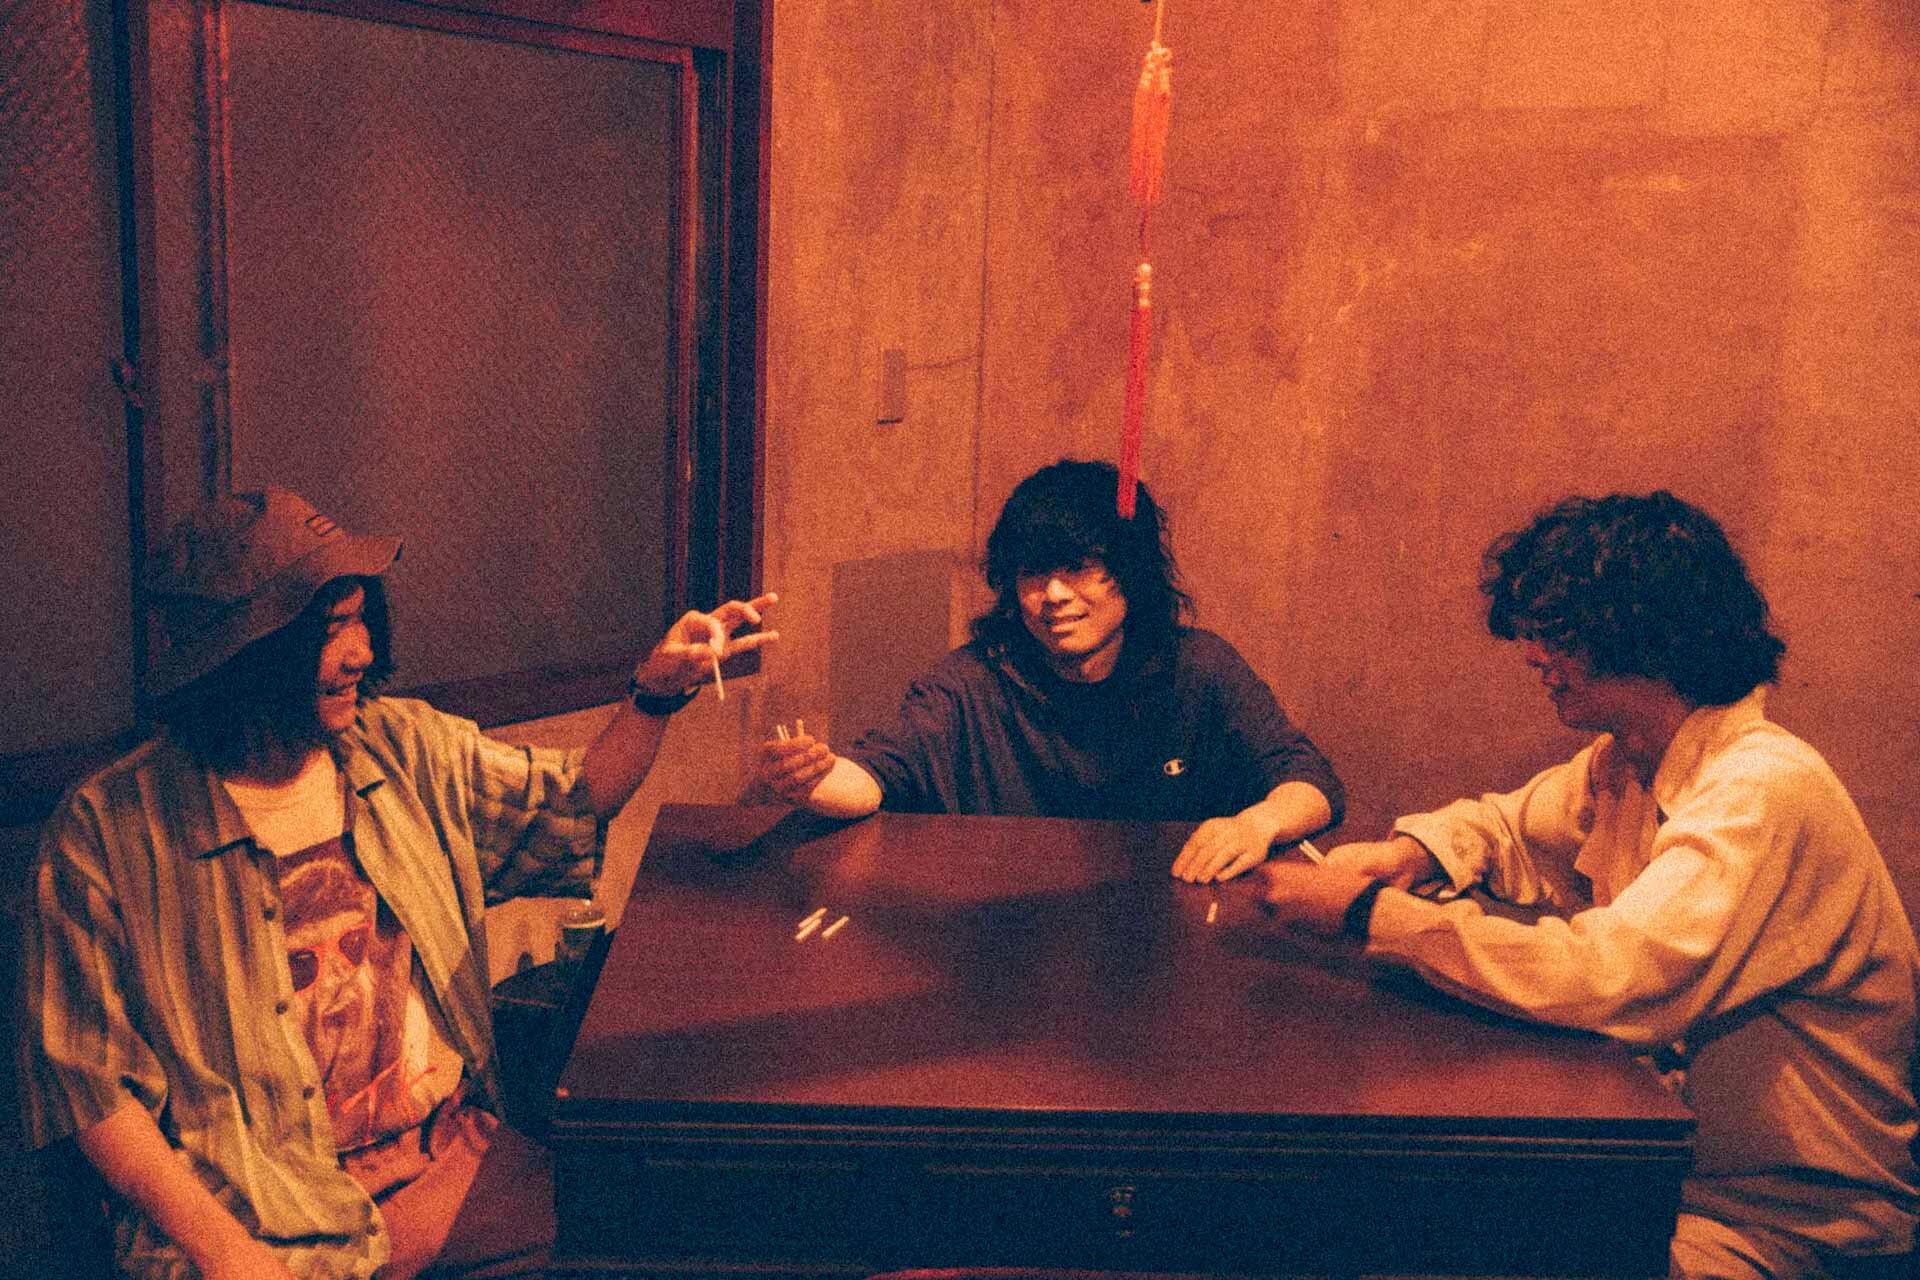 Tempalay × ドミコ × MONO NO AWARE「中国巡演」鼎談|盟友となった中国ツアーを振り返る interview1007_chinatour-0749